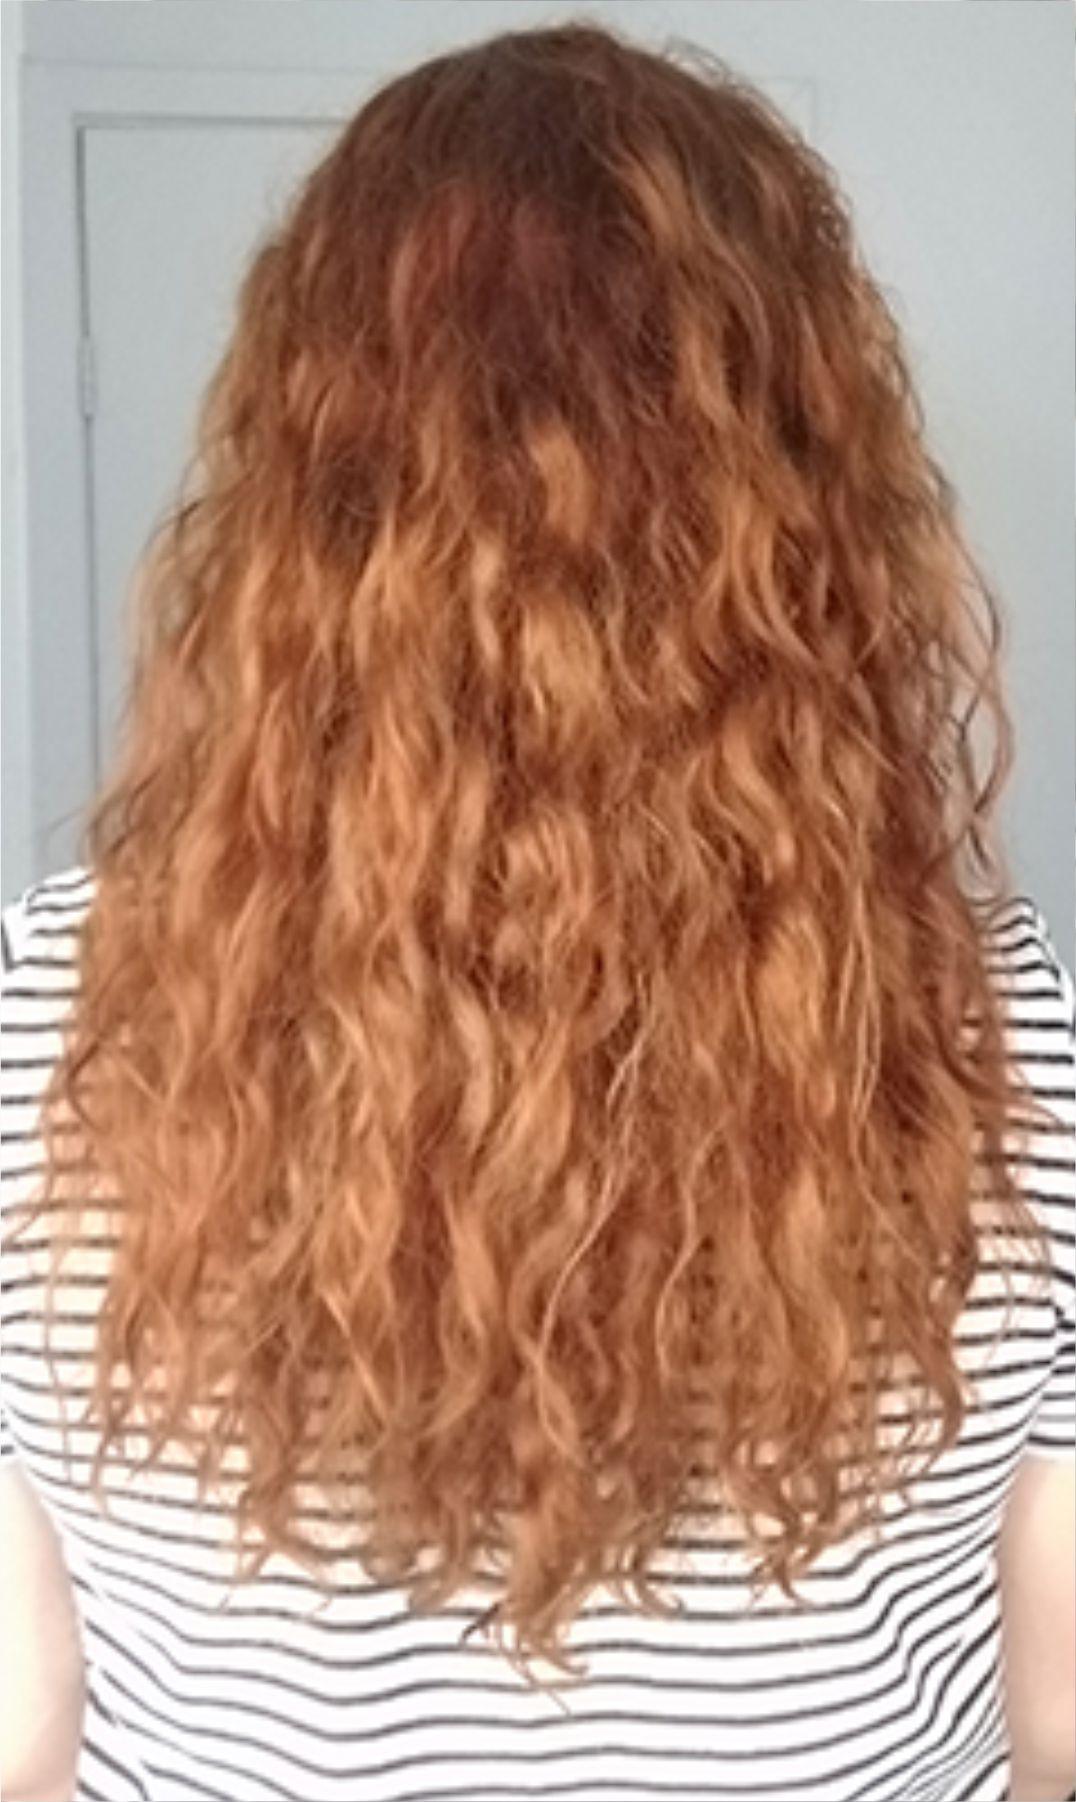 ANTES DEPOIS HAIR VITAMIN 1